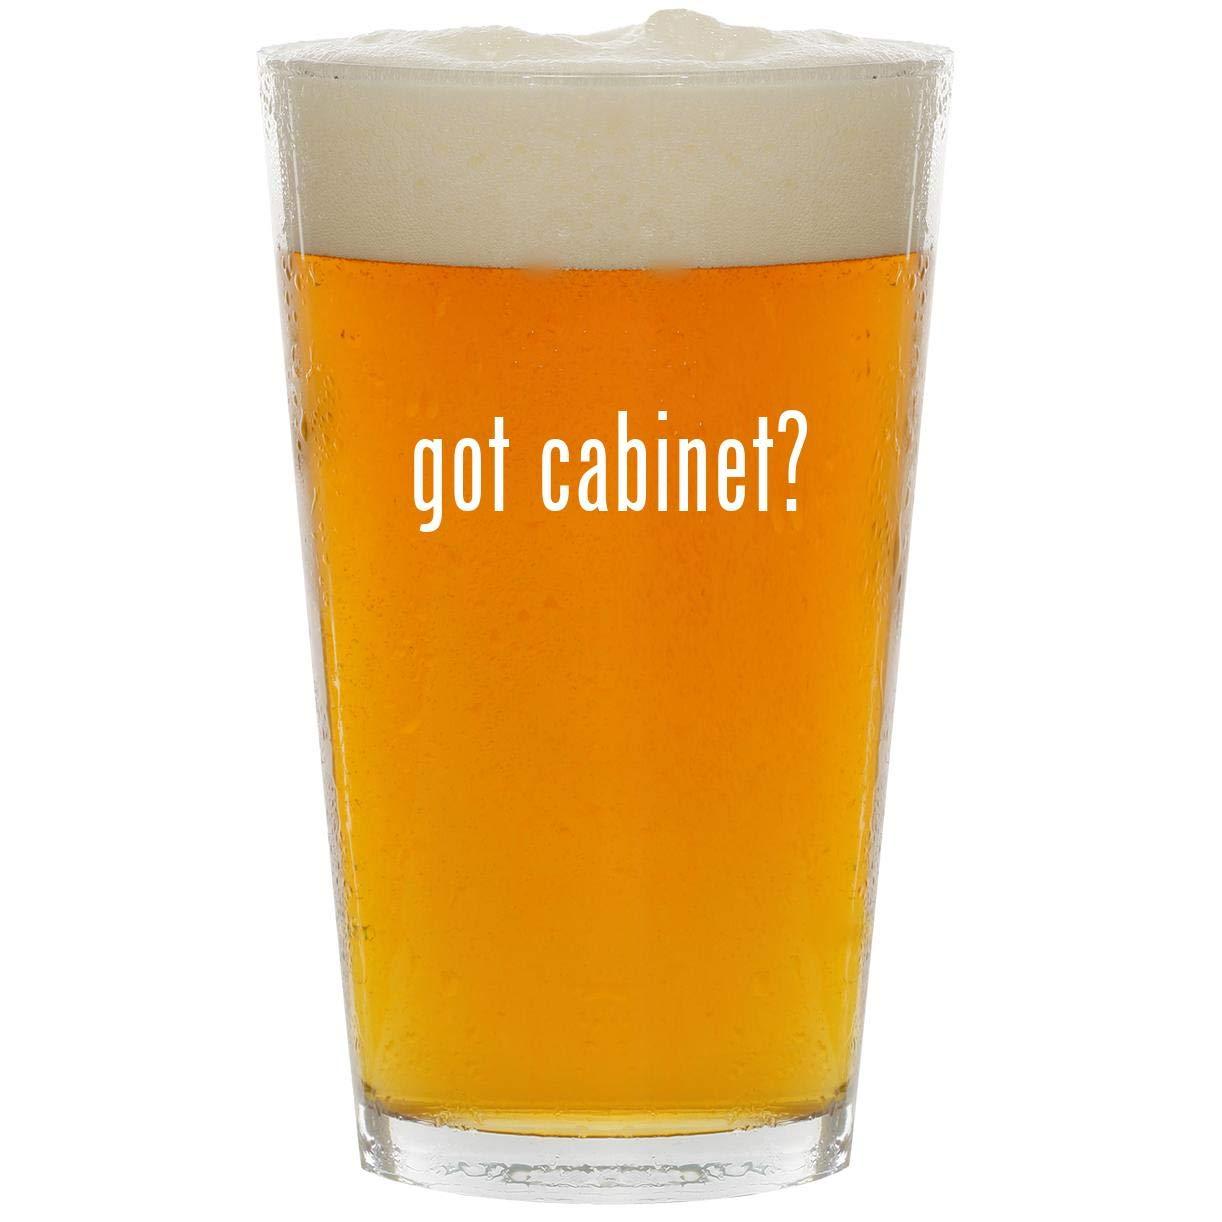 got cabinet? - Glass 16oz Beer Pint